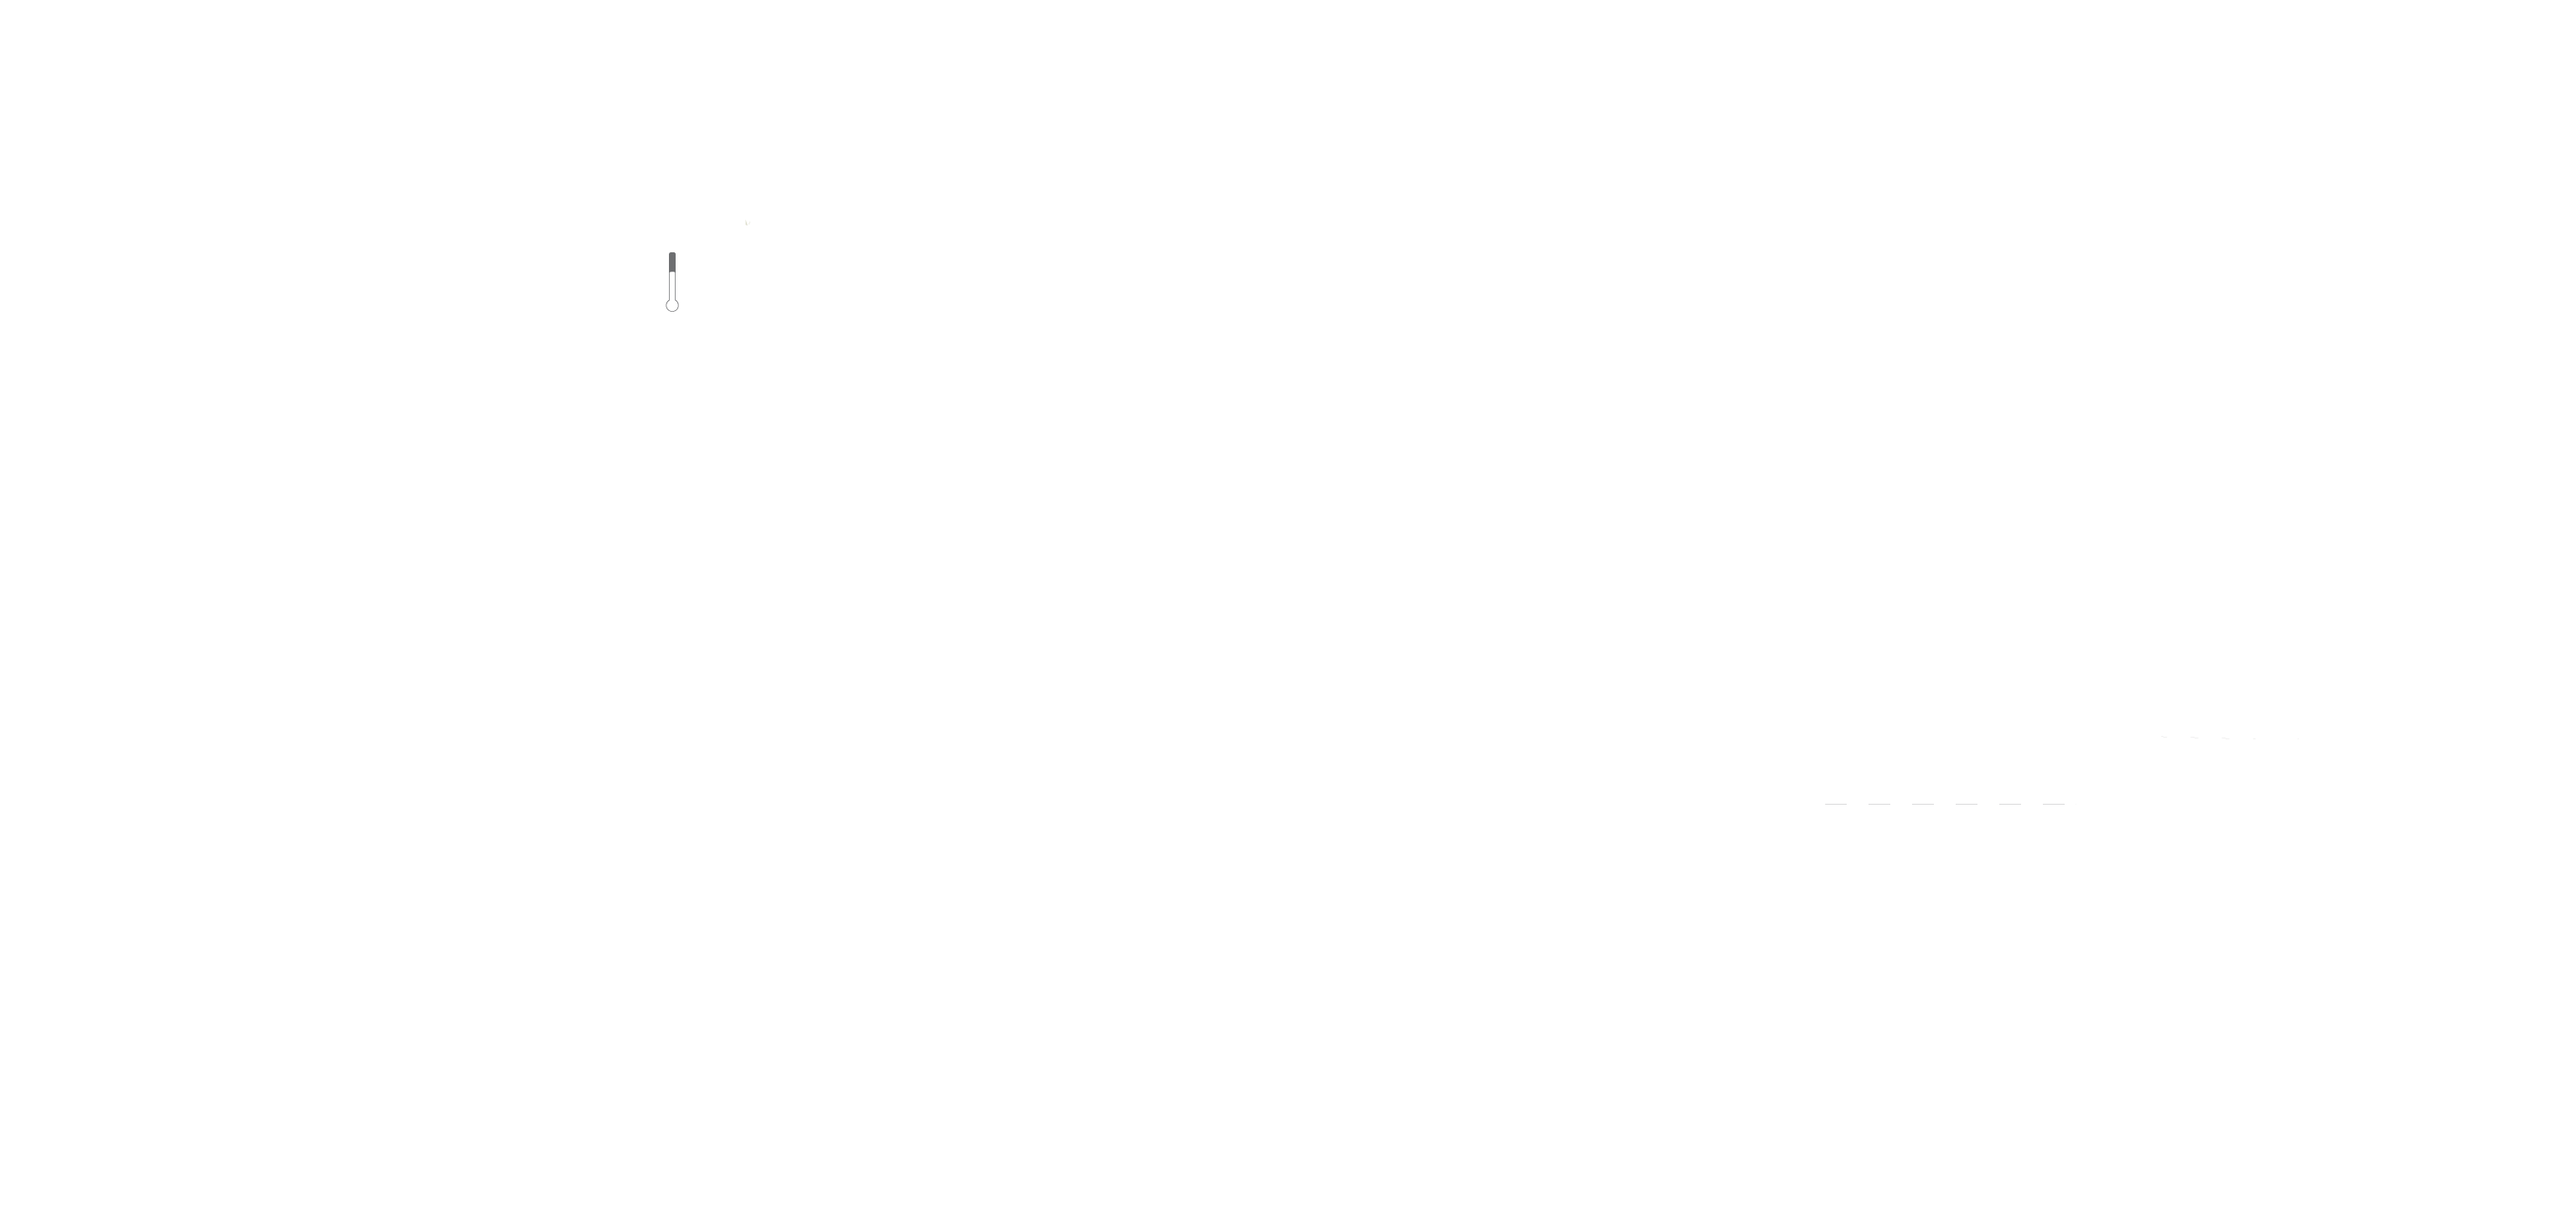 CleanBay Process infographic described in steps below.